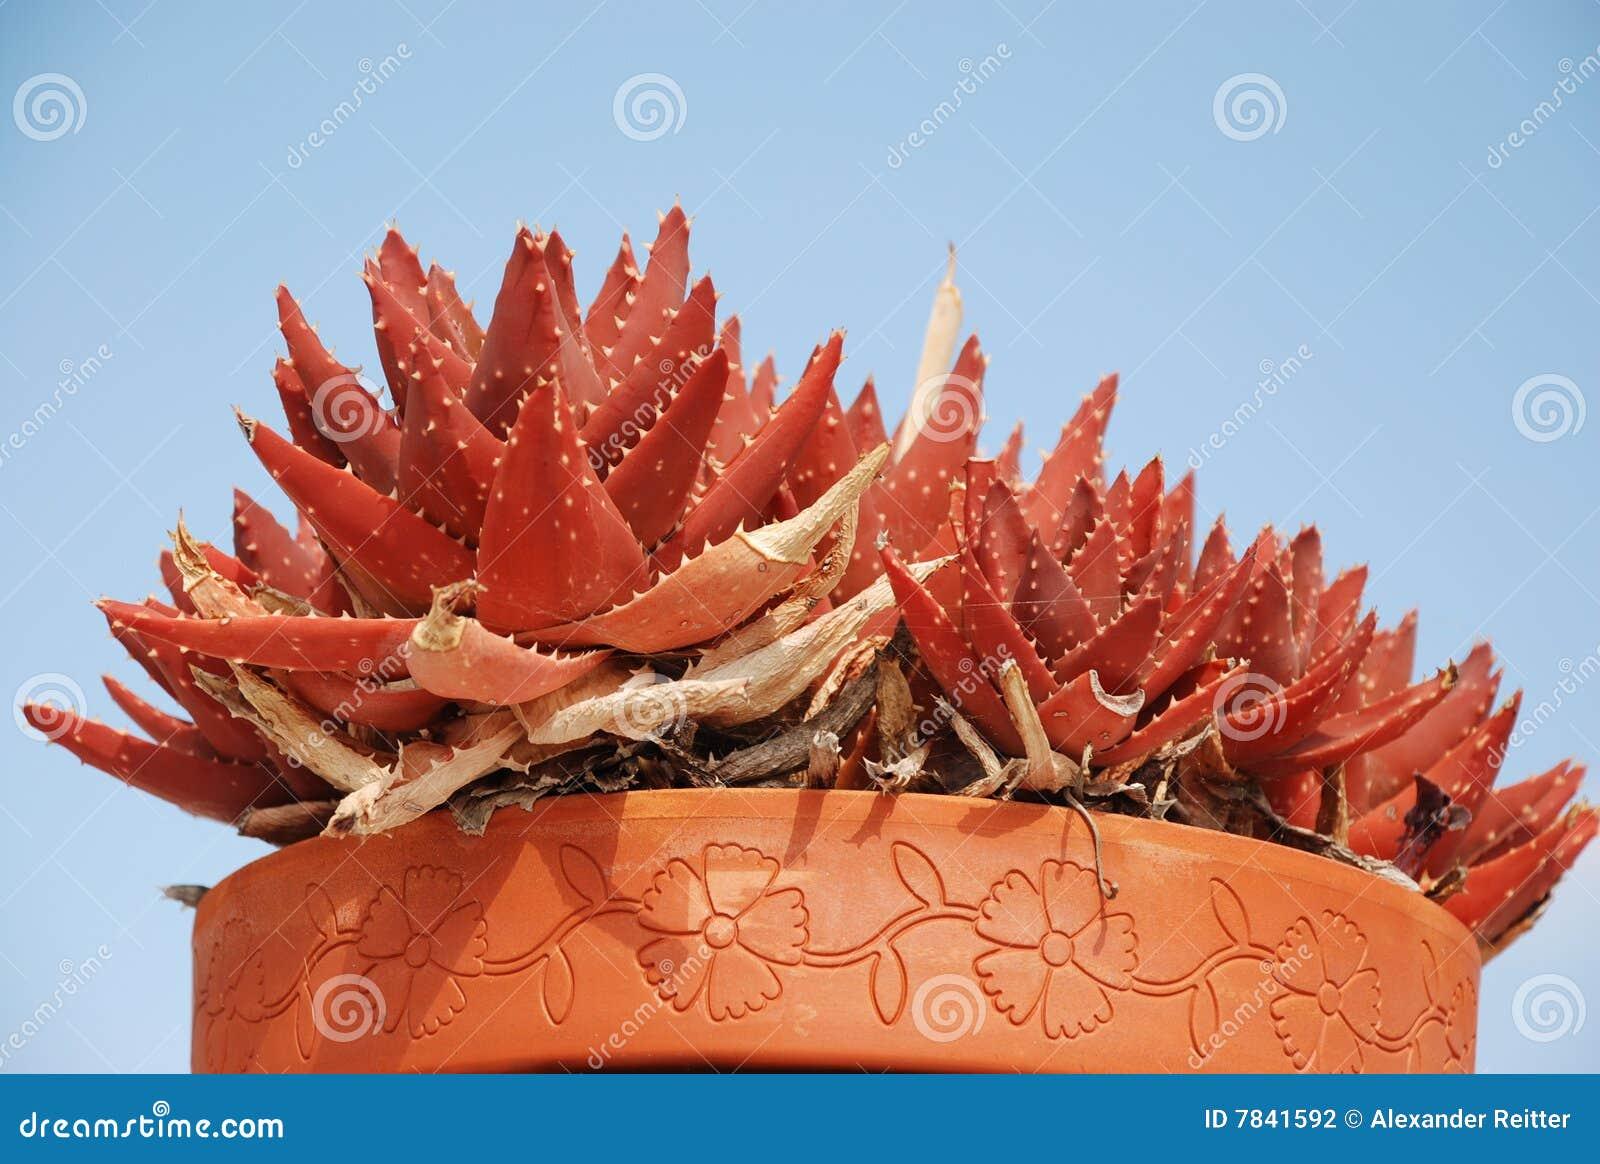 Red Aloe Vera Stock Photography - Image: 7841592: dreamstime.com/stock-photography-red-aloe-vera-image7841592